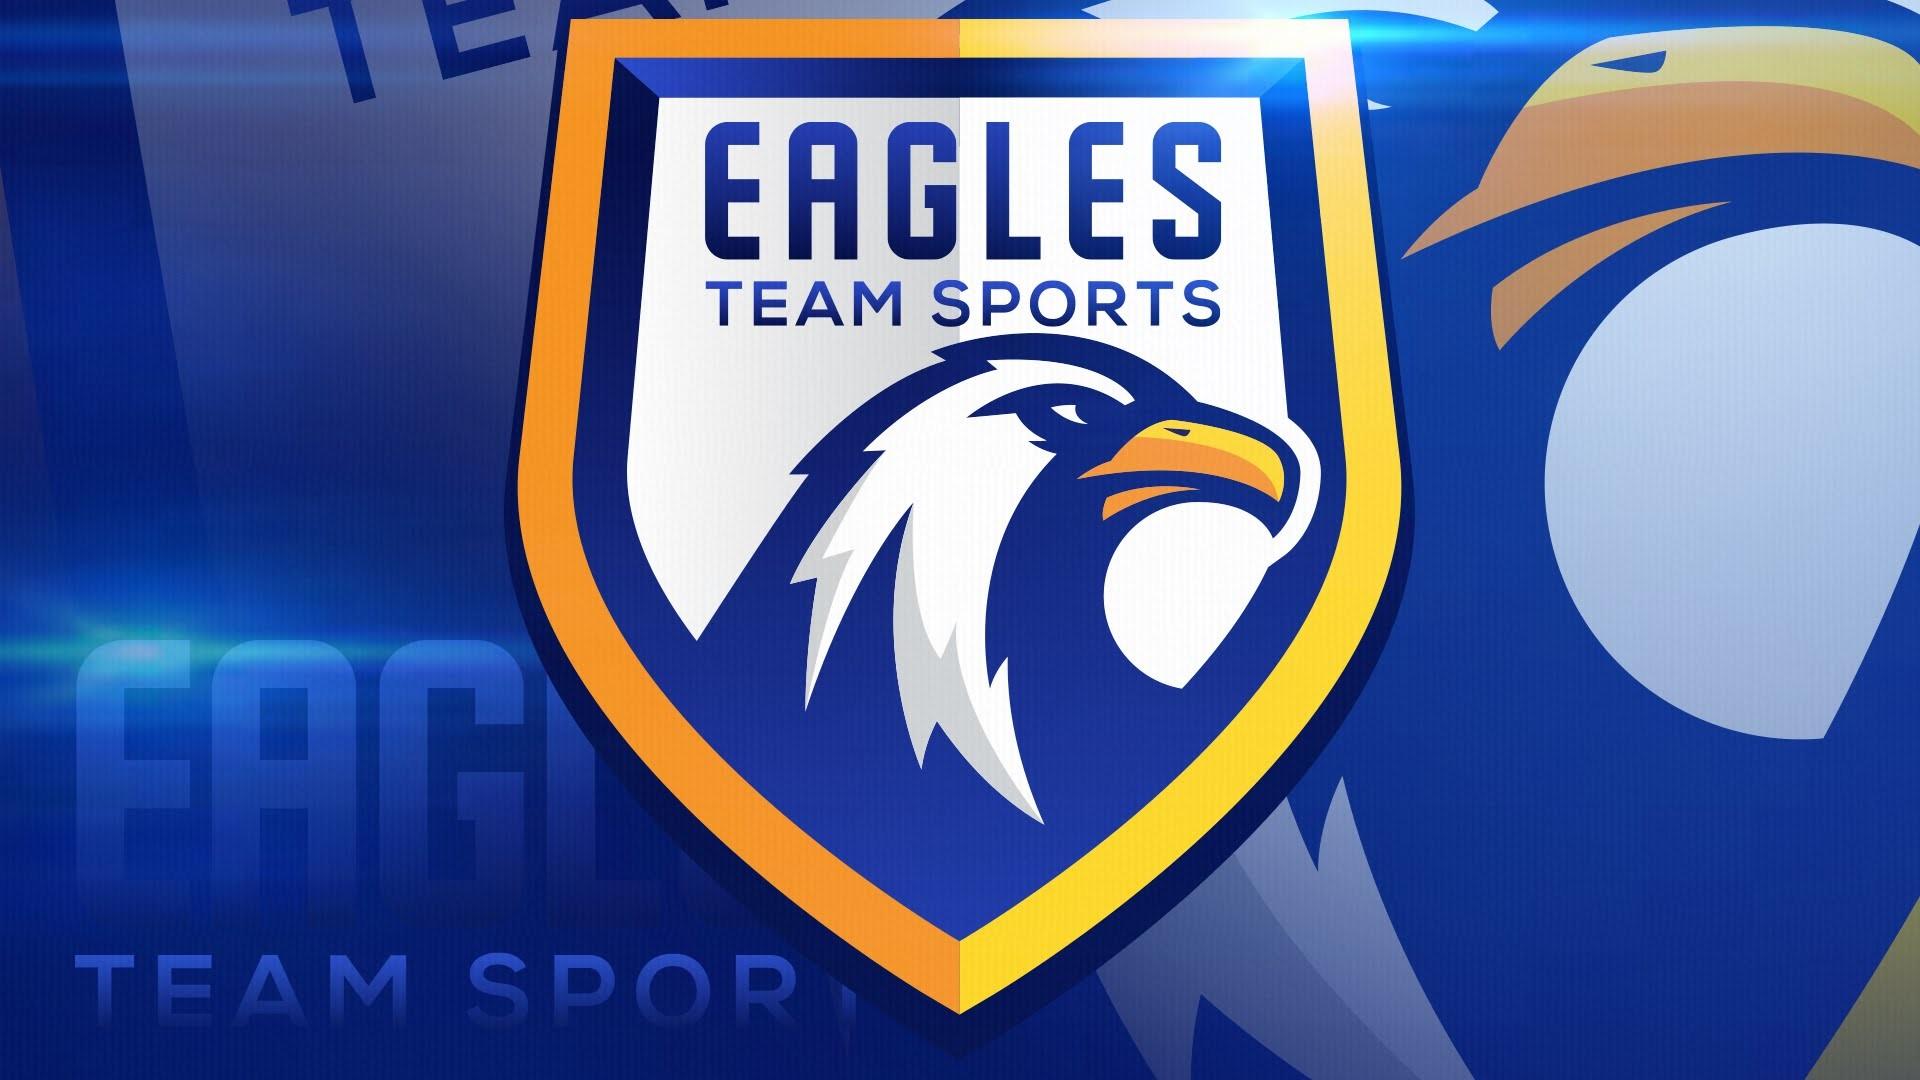 Res: 1920x1080, eagles logo design